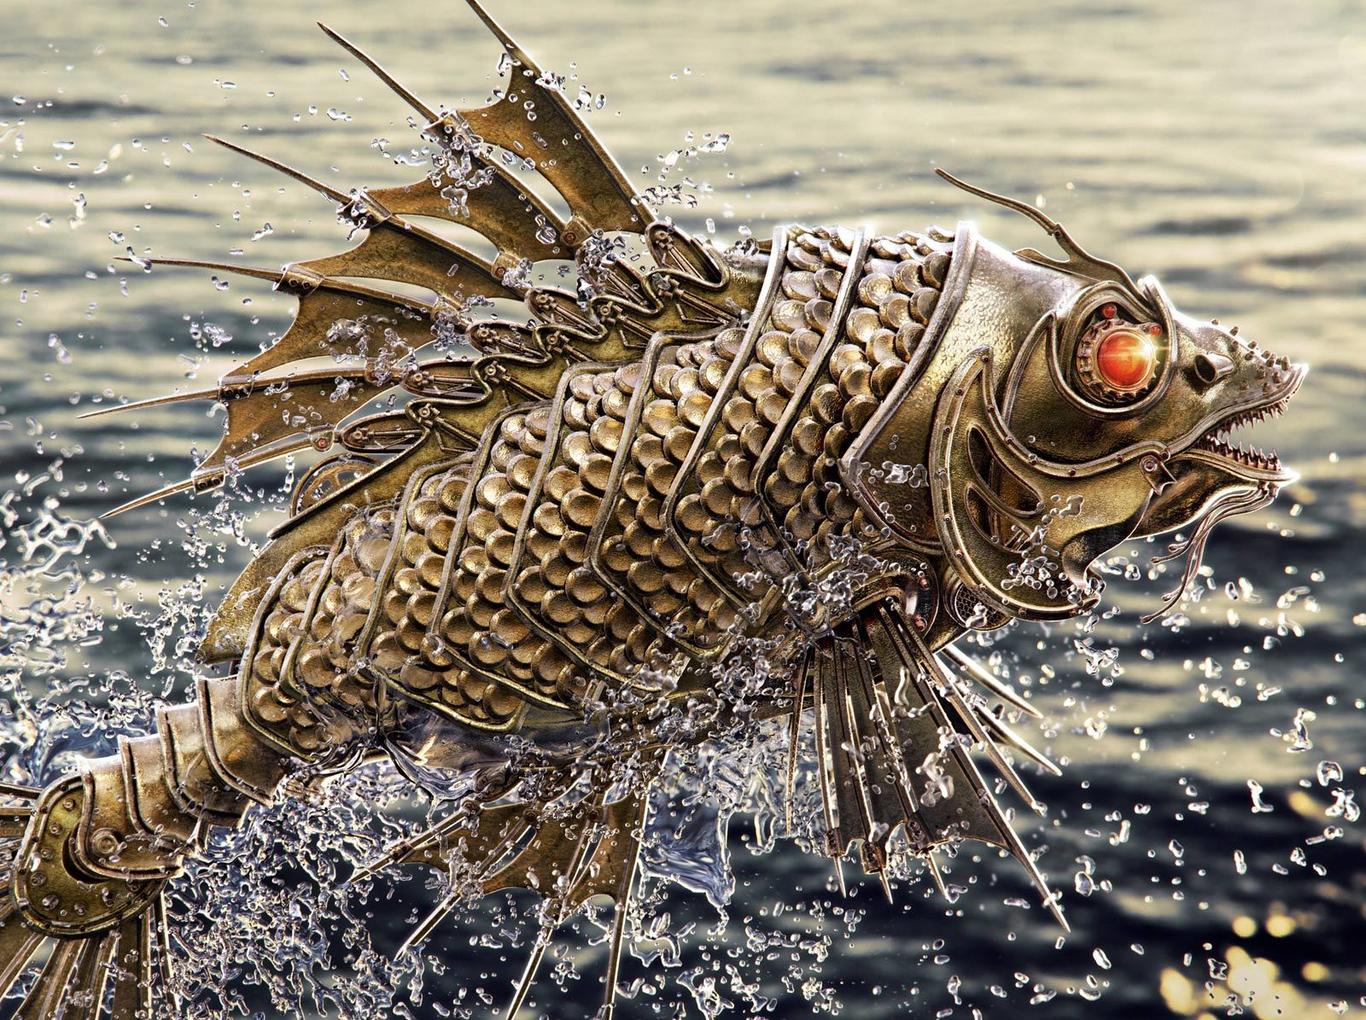 Alekscg goldfish zoom 1 2864804b 4tg8